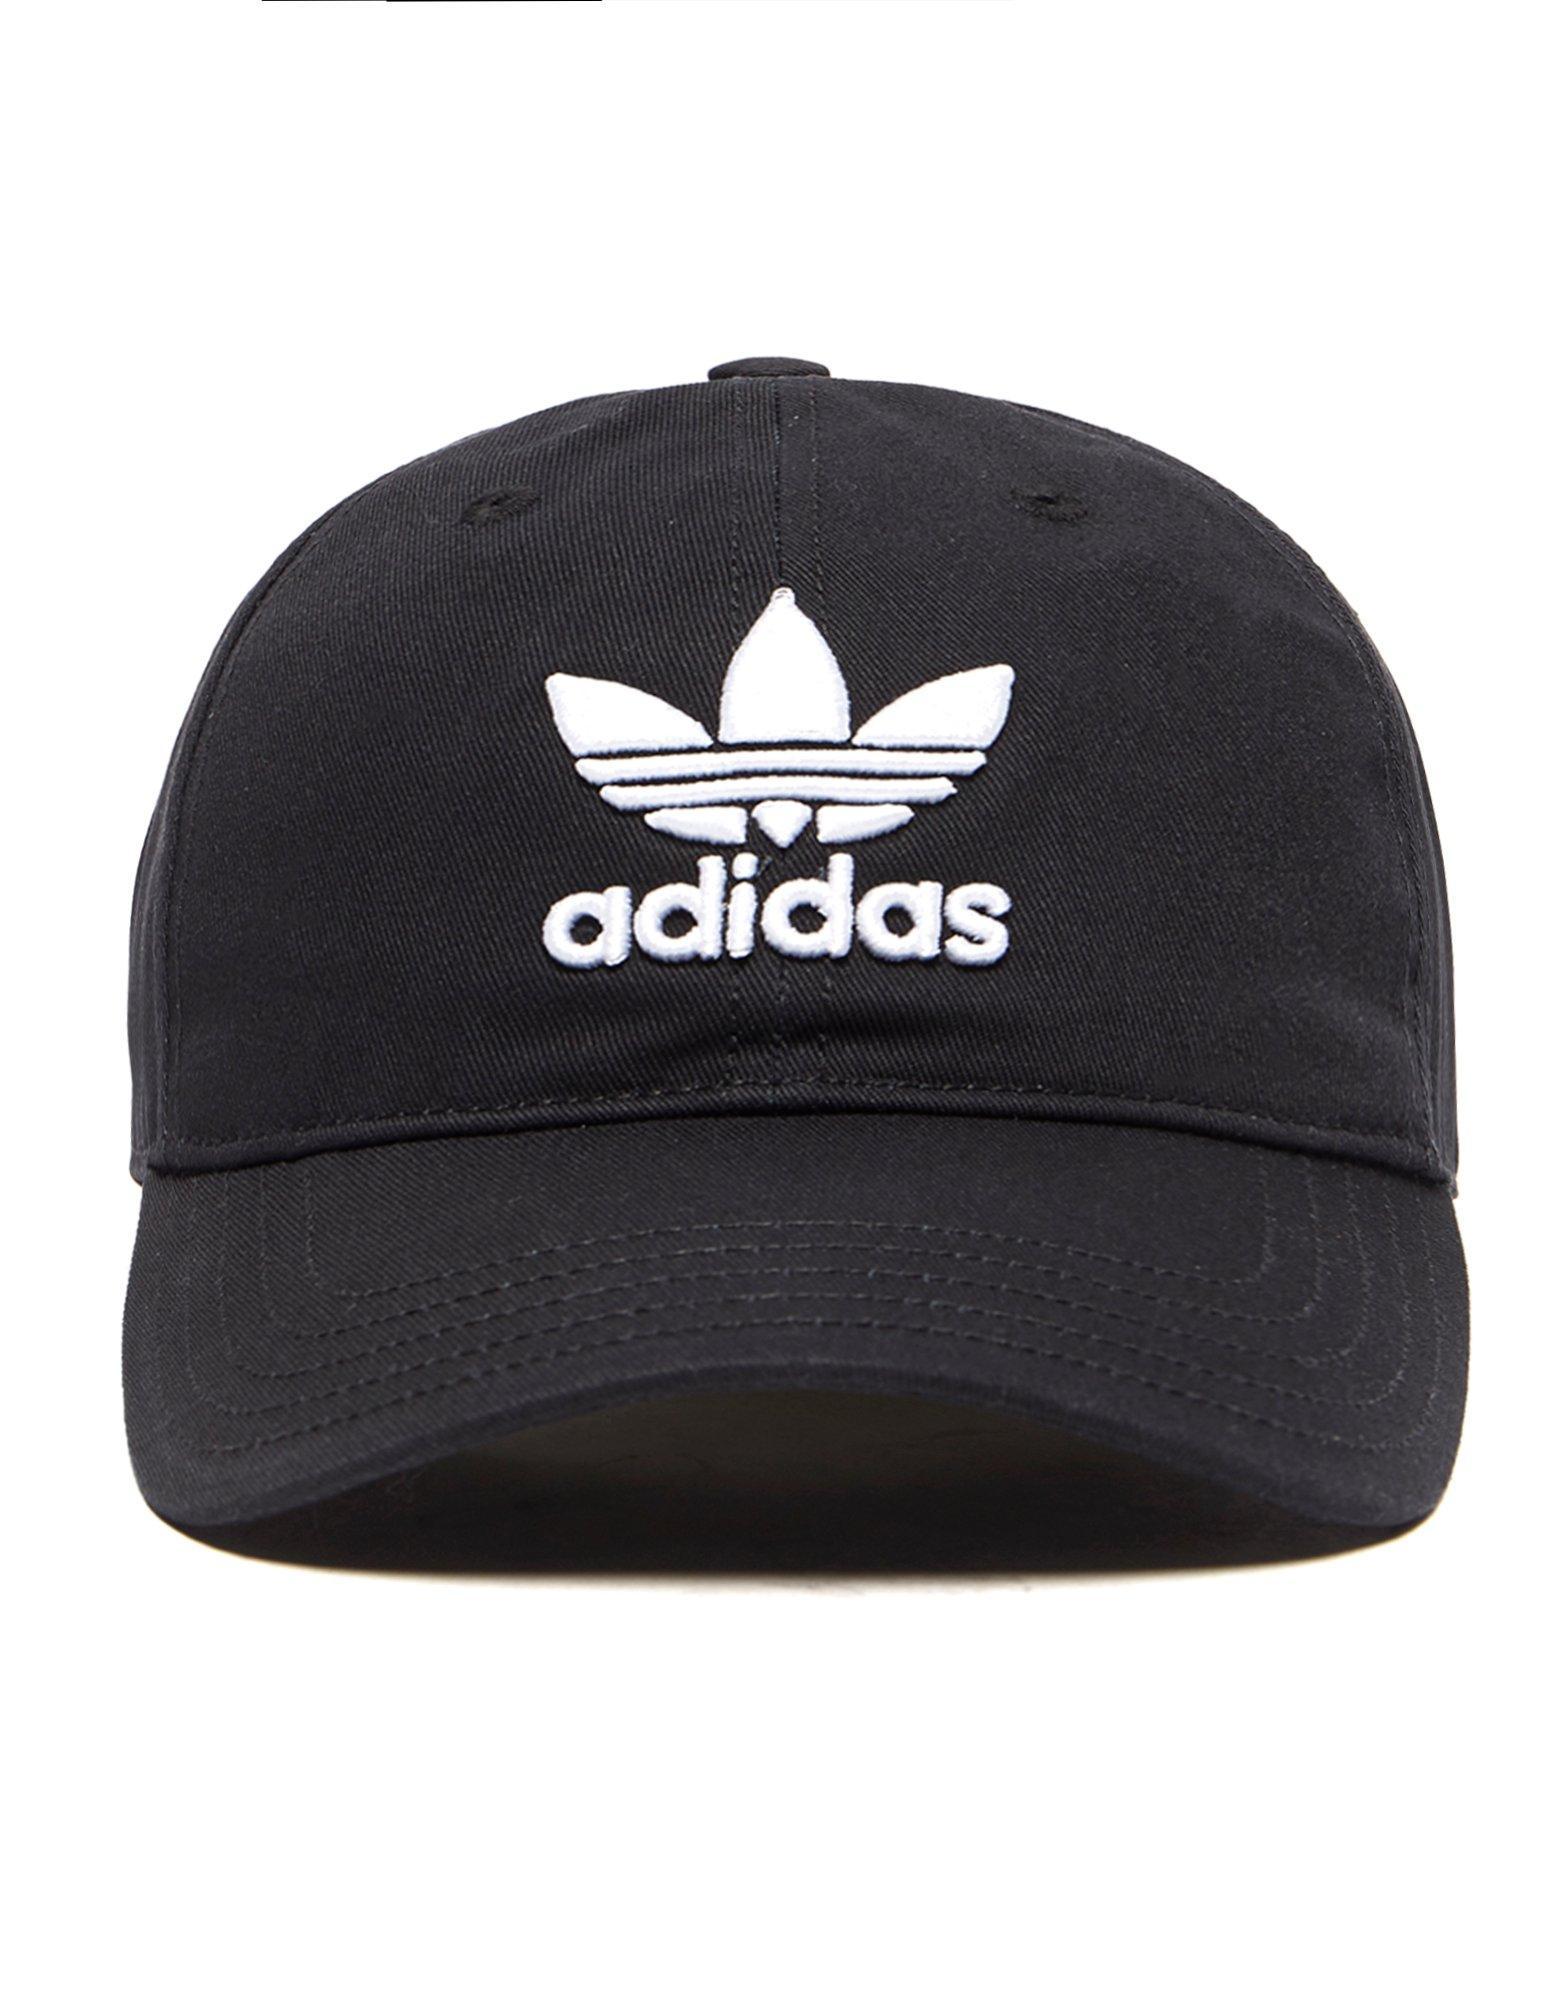 adidas cap adidas originals trefoil classic cap ... YSKLBUT